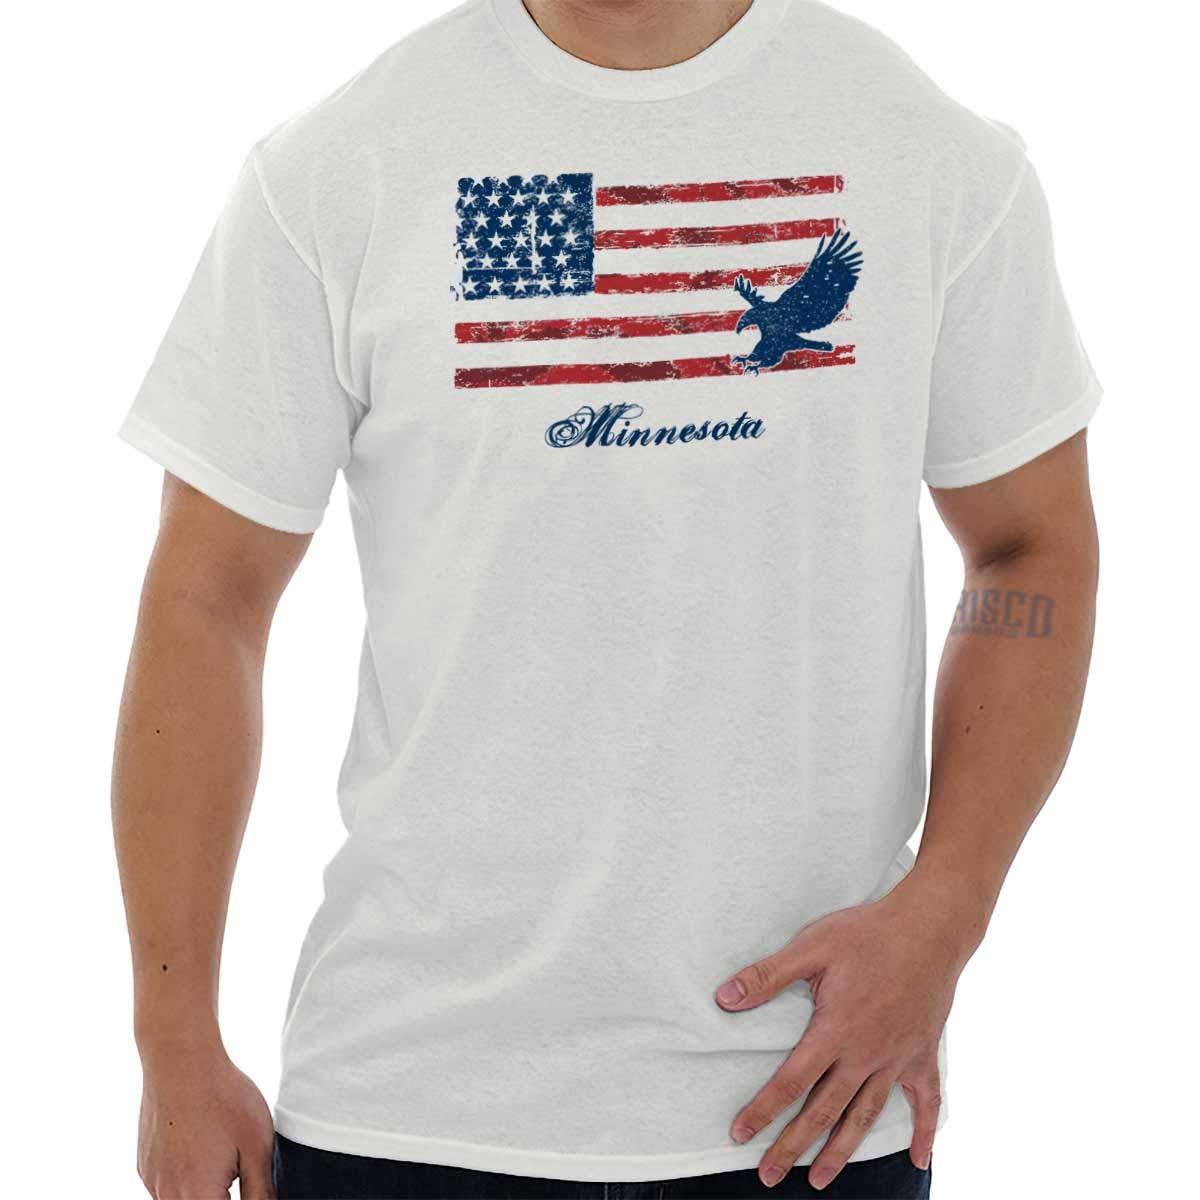 Minnesota Usa T Shirt American Flag Shirt Vintage Gift Ideas T Shirt